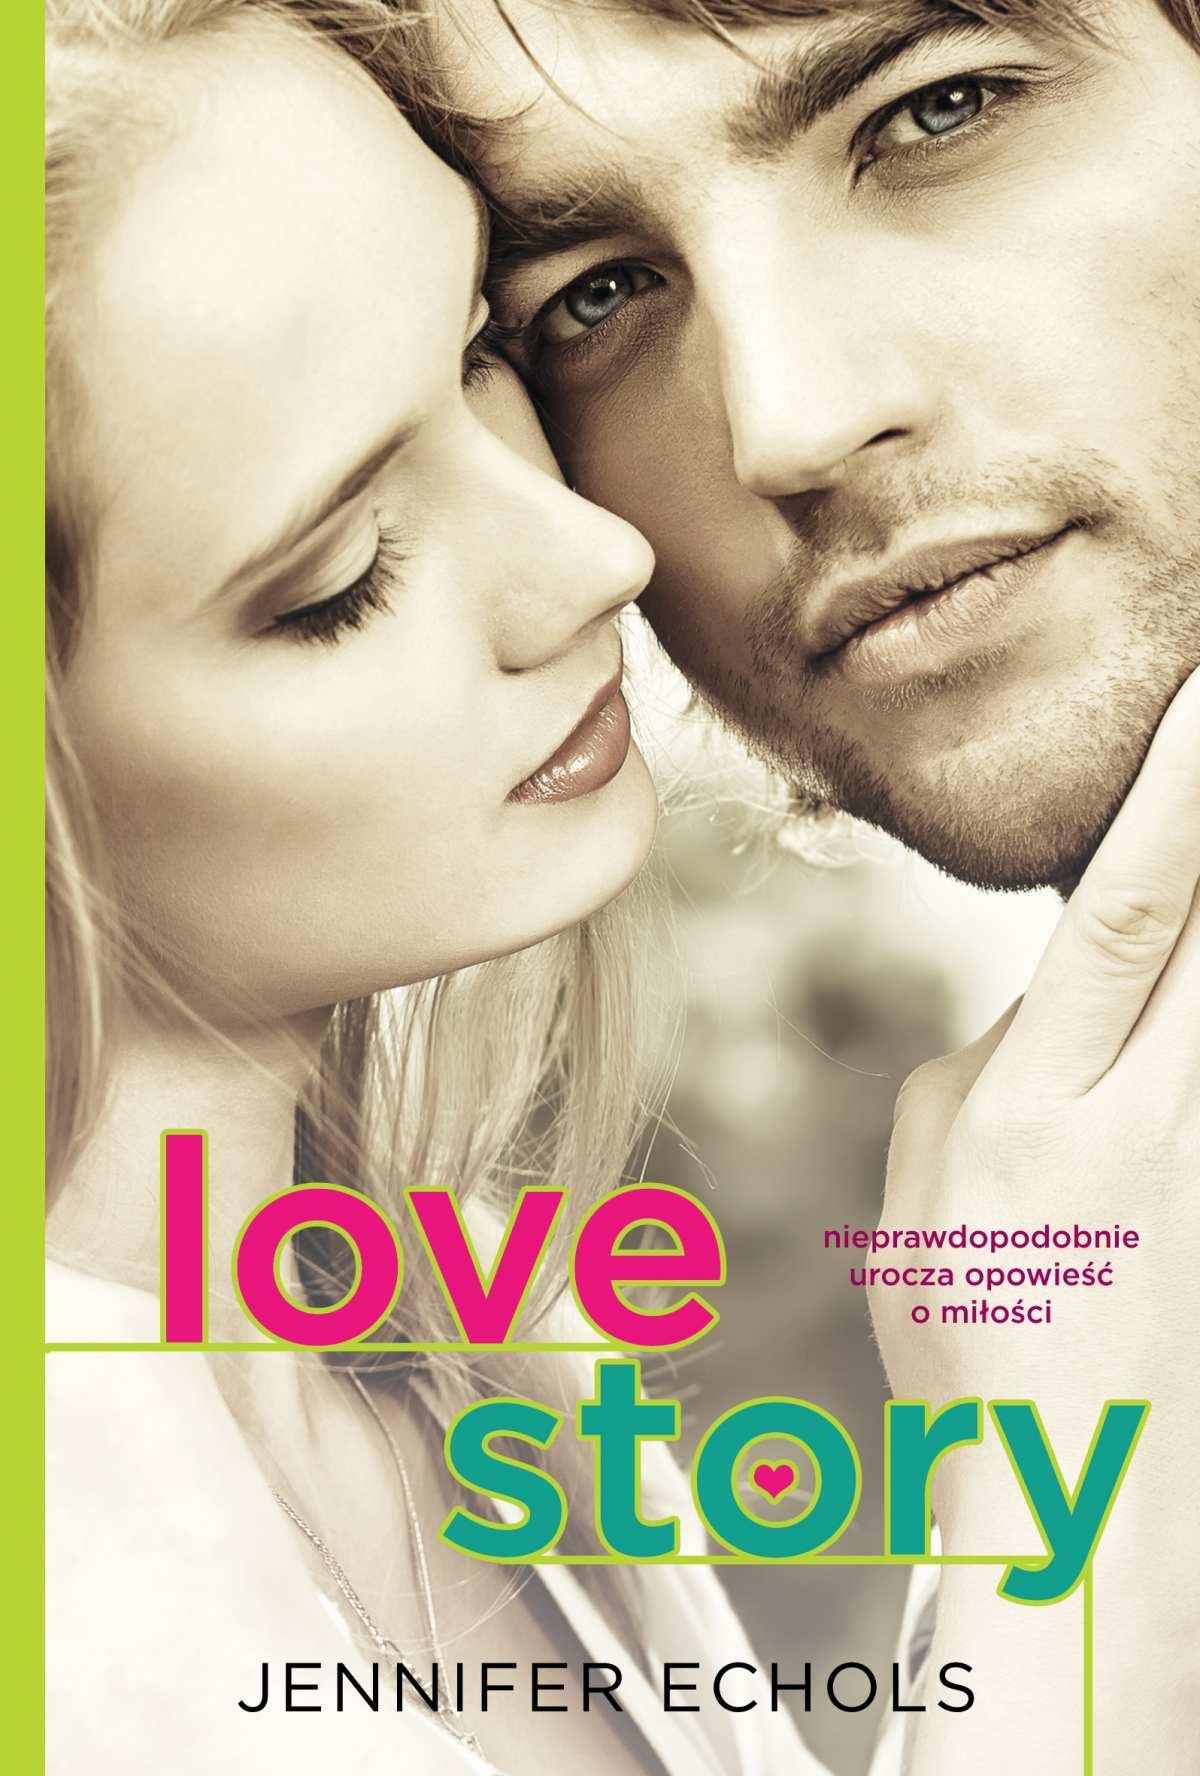 Love story - Ebook (Książka EPUB) do pobrania w formacie EPUB